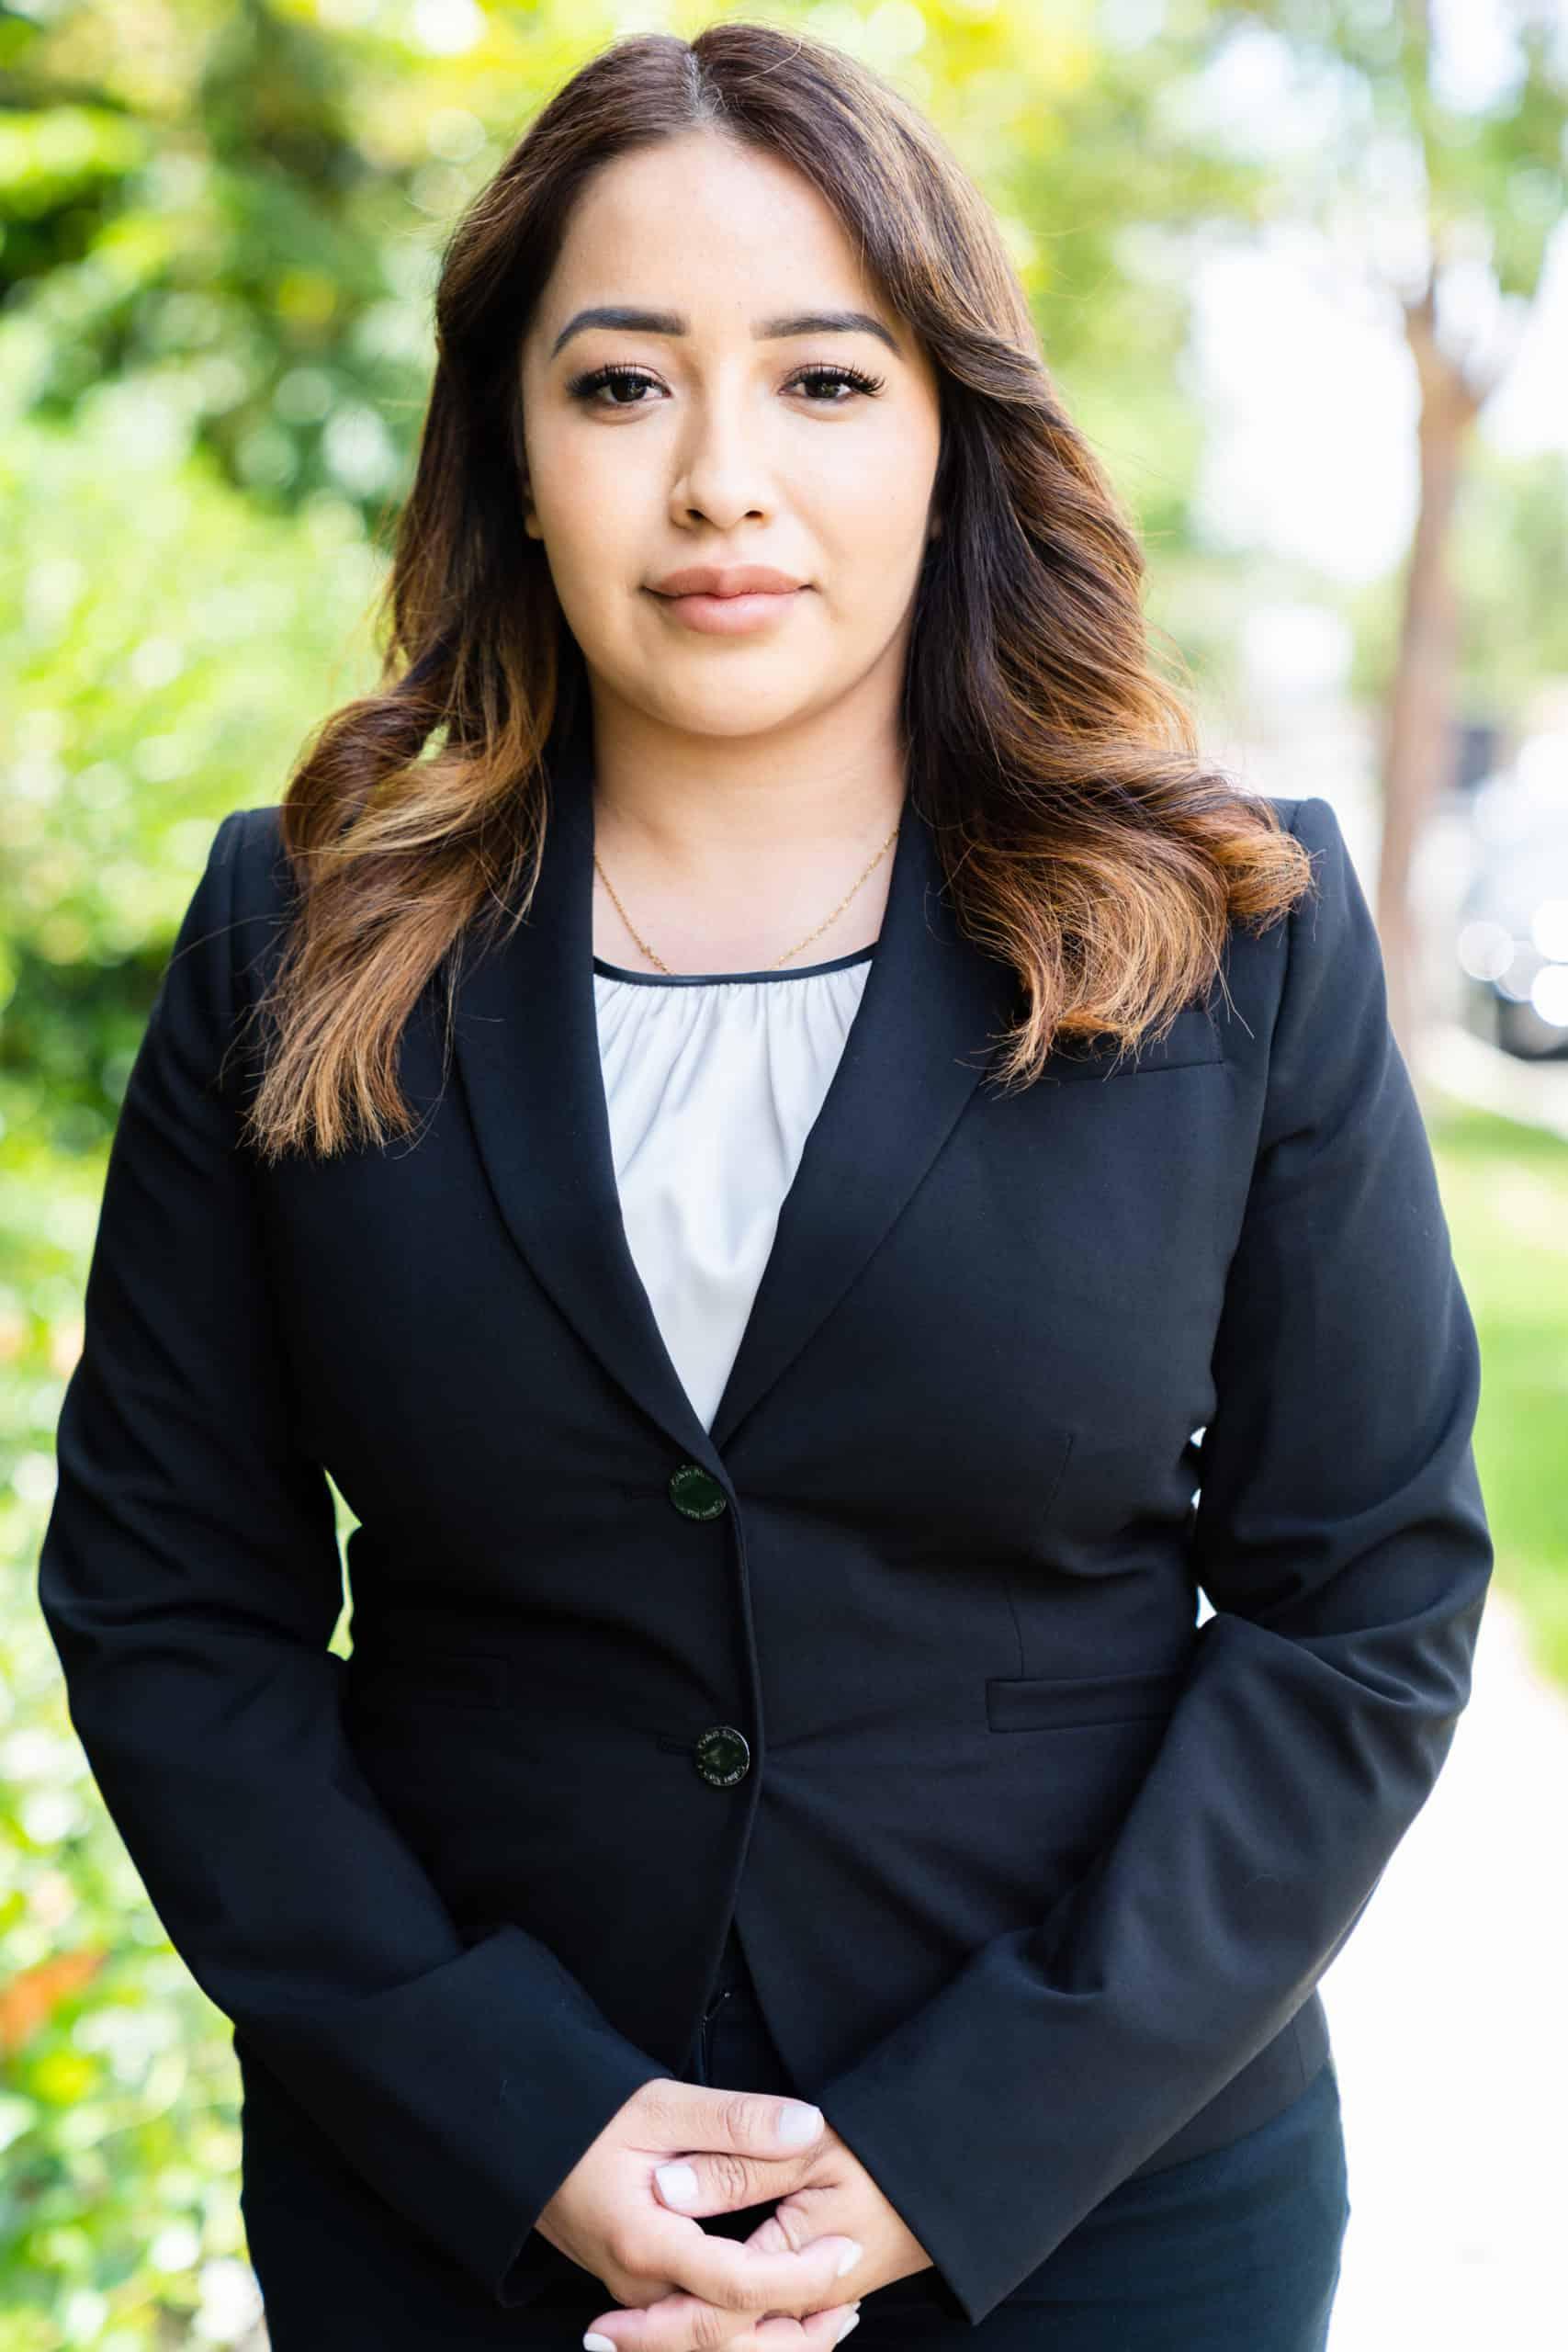 santa ana personal injury attorneys razavi law group